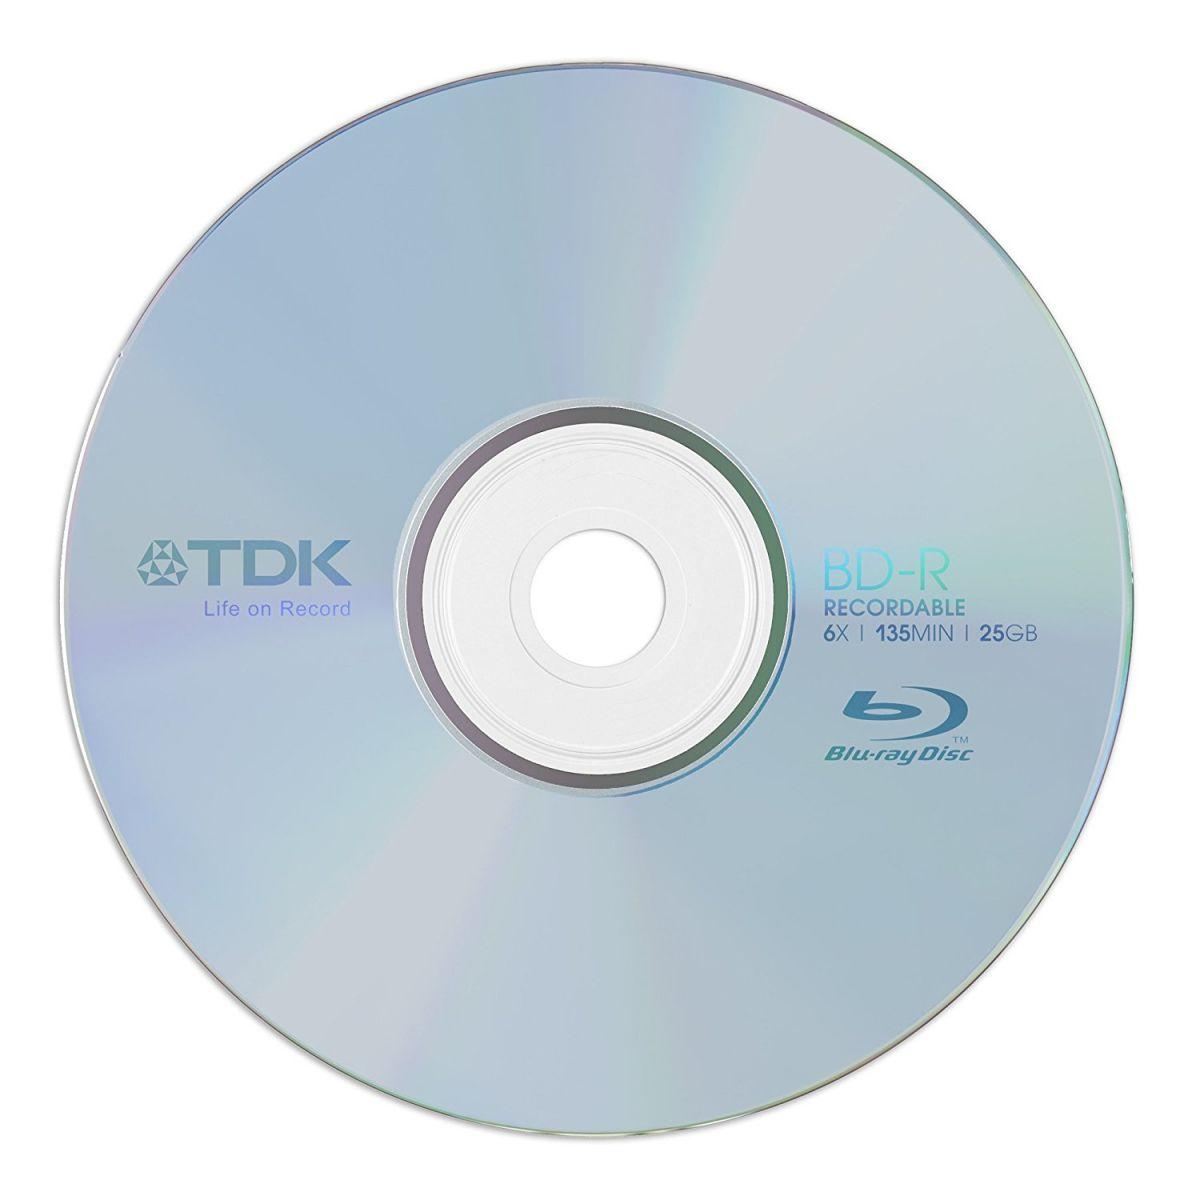 BD-R TDK 25GB 6X